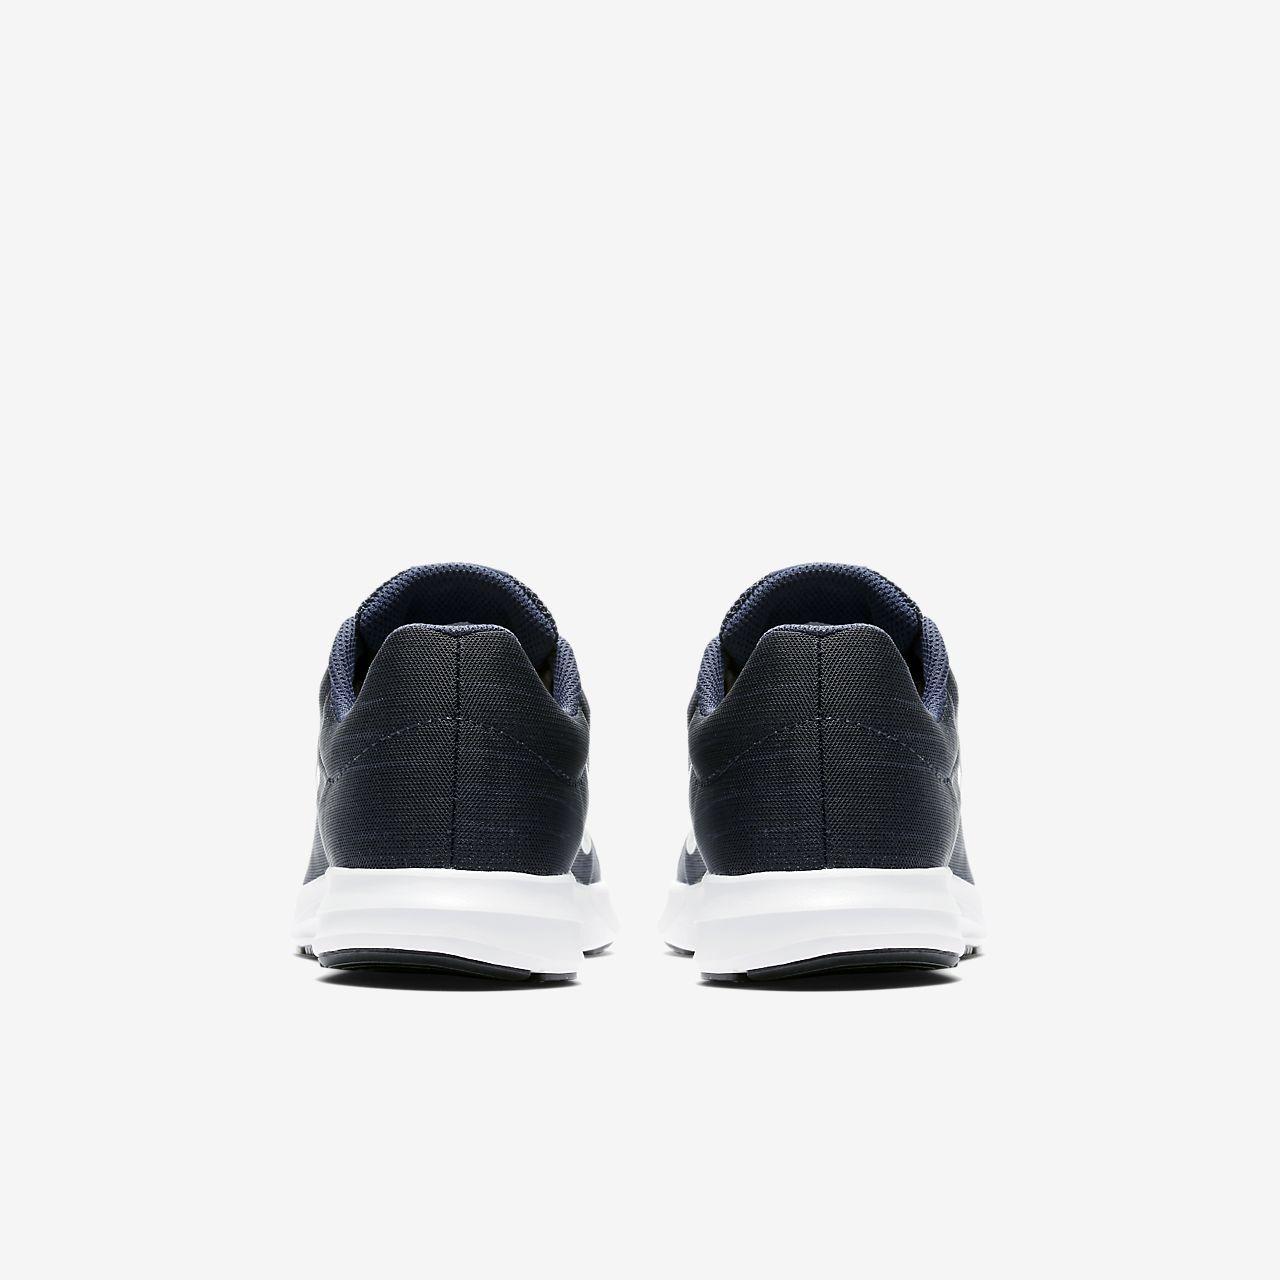 dd5457f34e7 Nike Downshifter 8 Older Kids  (Boys ) Running Shoe. Nike.com GB